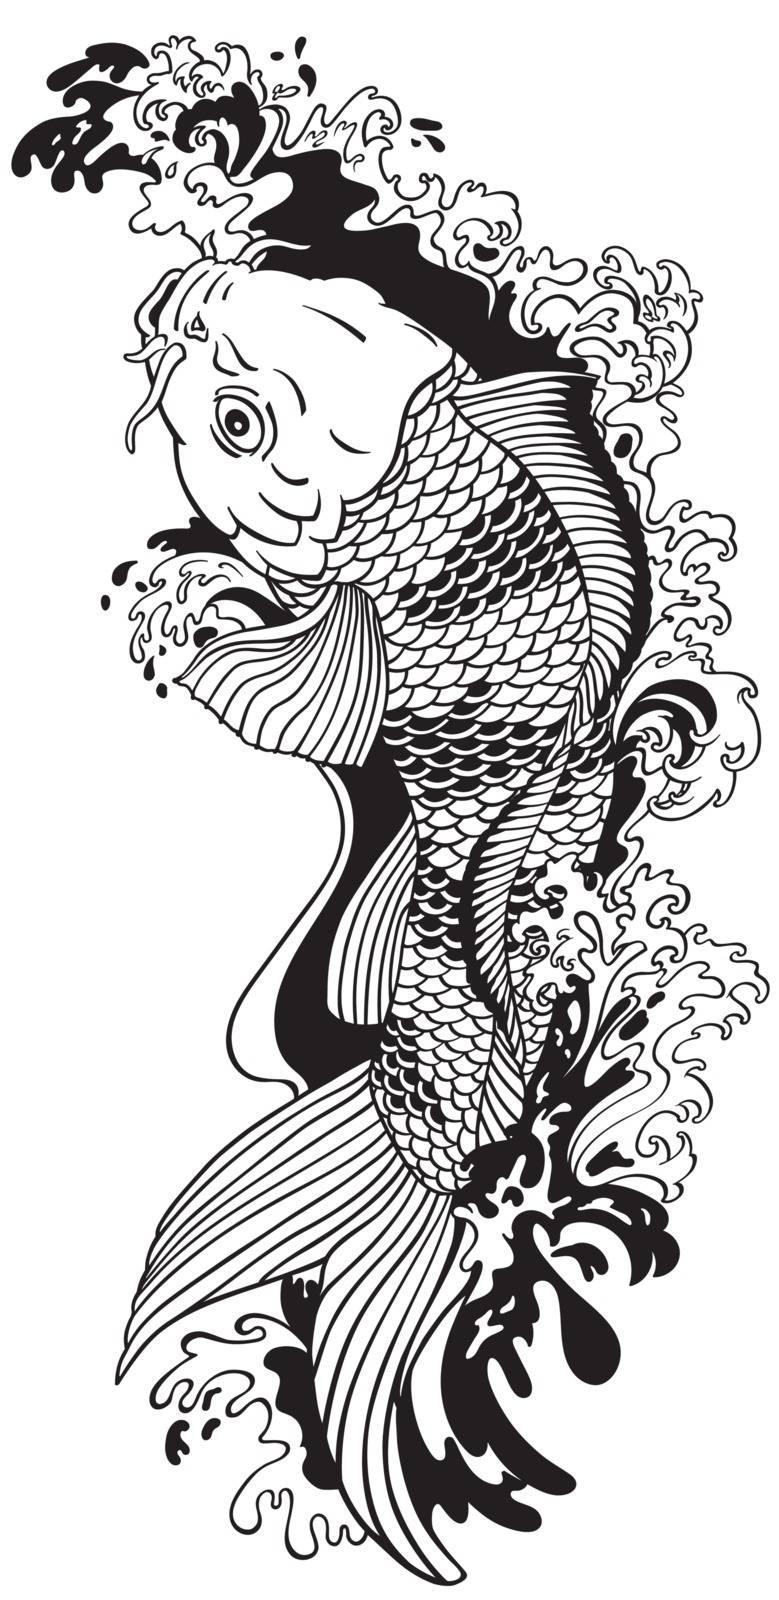 koi carp gold fish swimming upstream. Black and white vector illustration tattoo style drawing